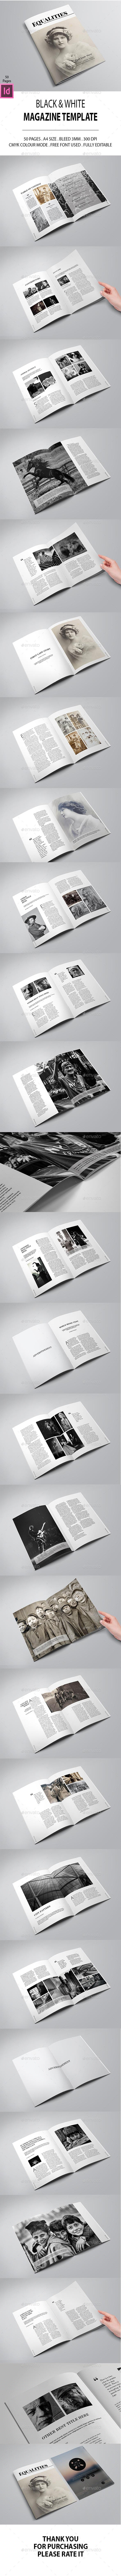 Clean Black & White Magazine - Magazines Print Templates